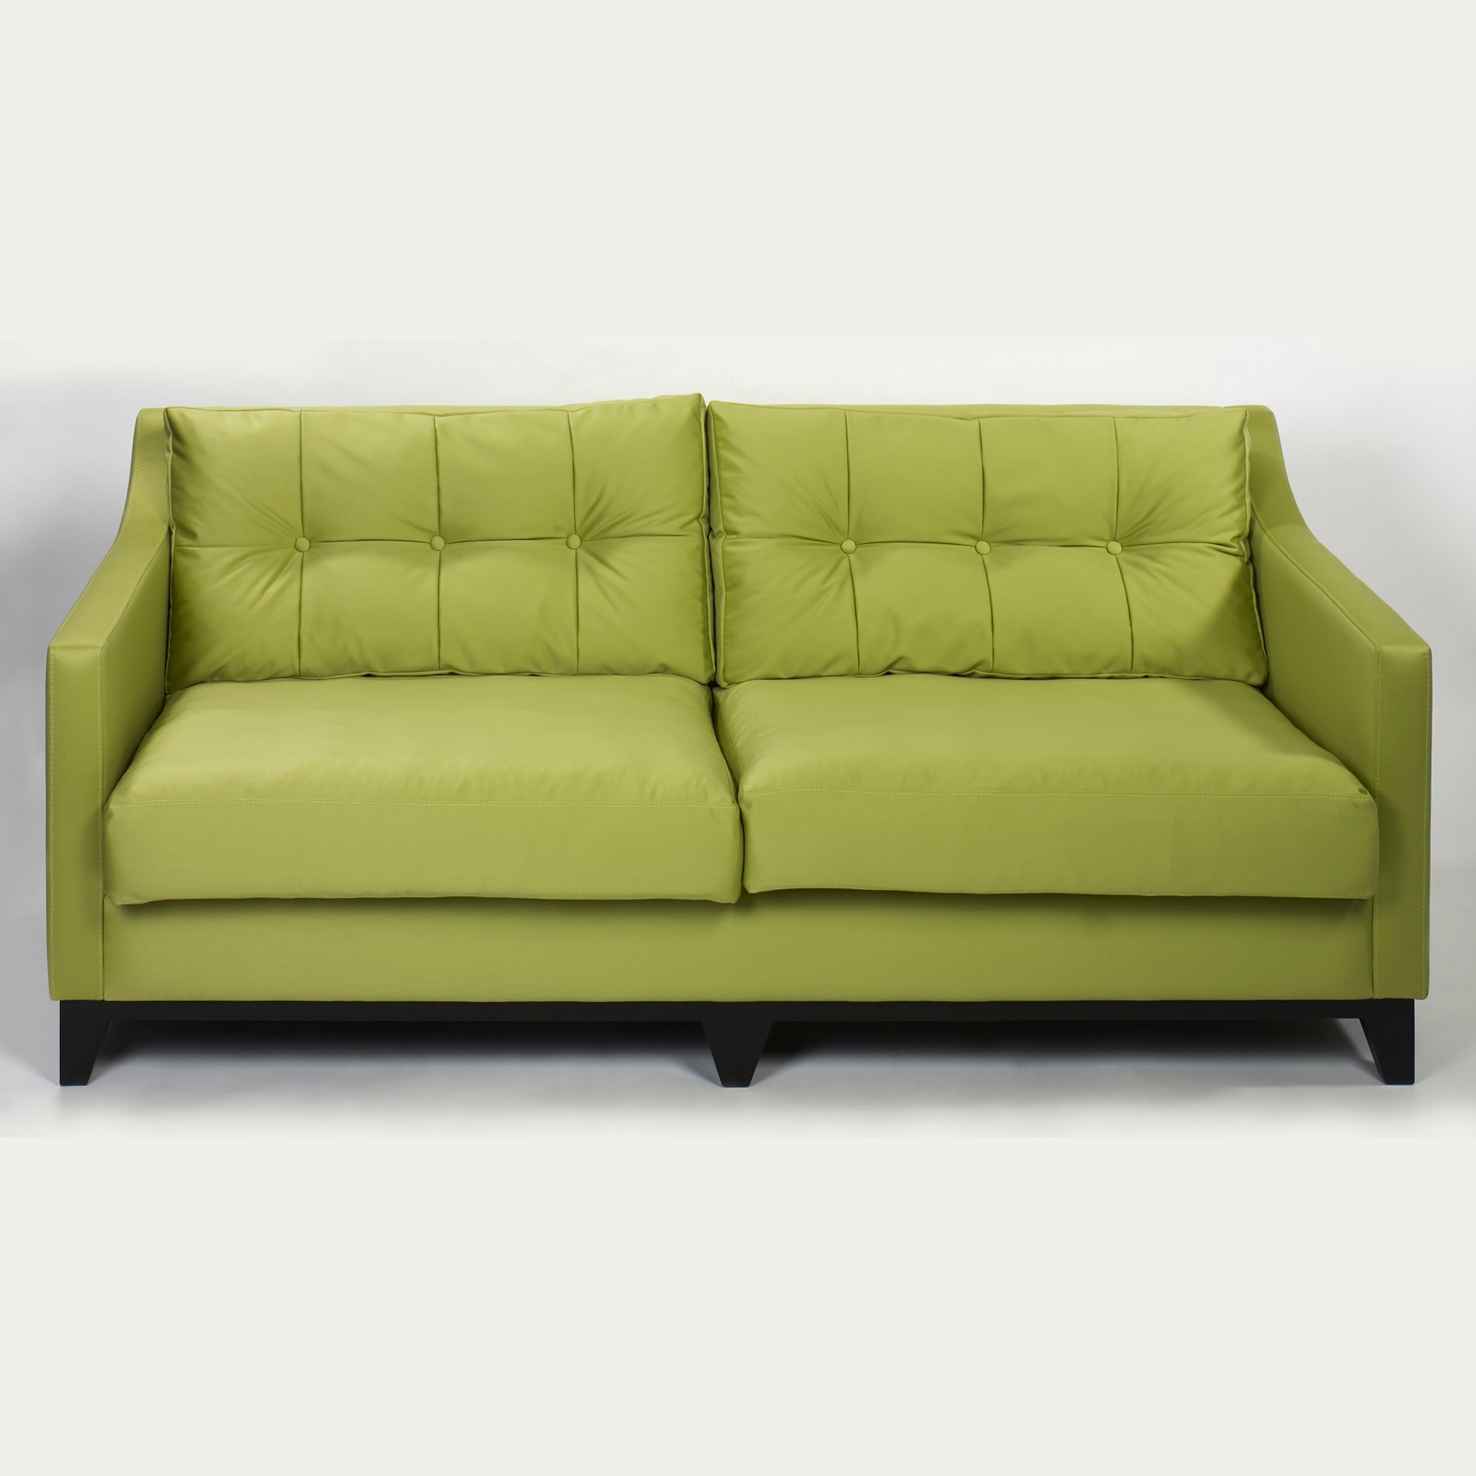 Lambert bonnie sofa ii wei polster inkl 2 r ckenpolster for Sofa 80 cm tief